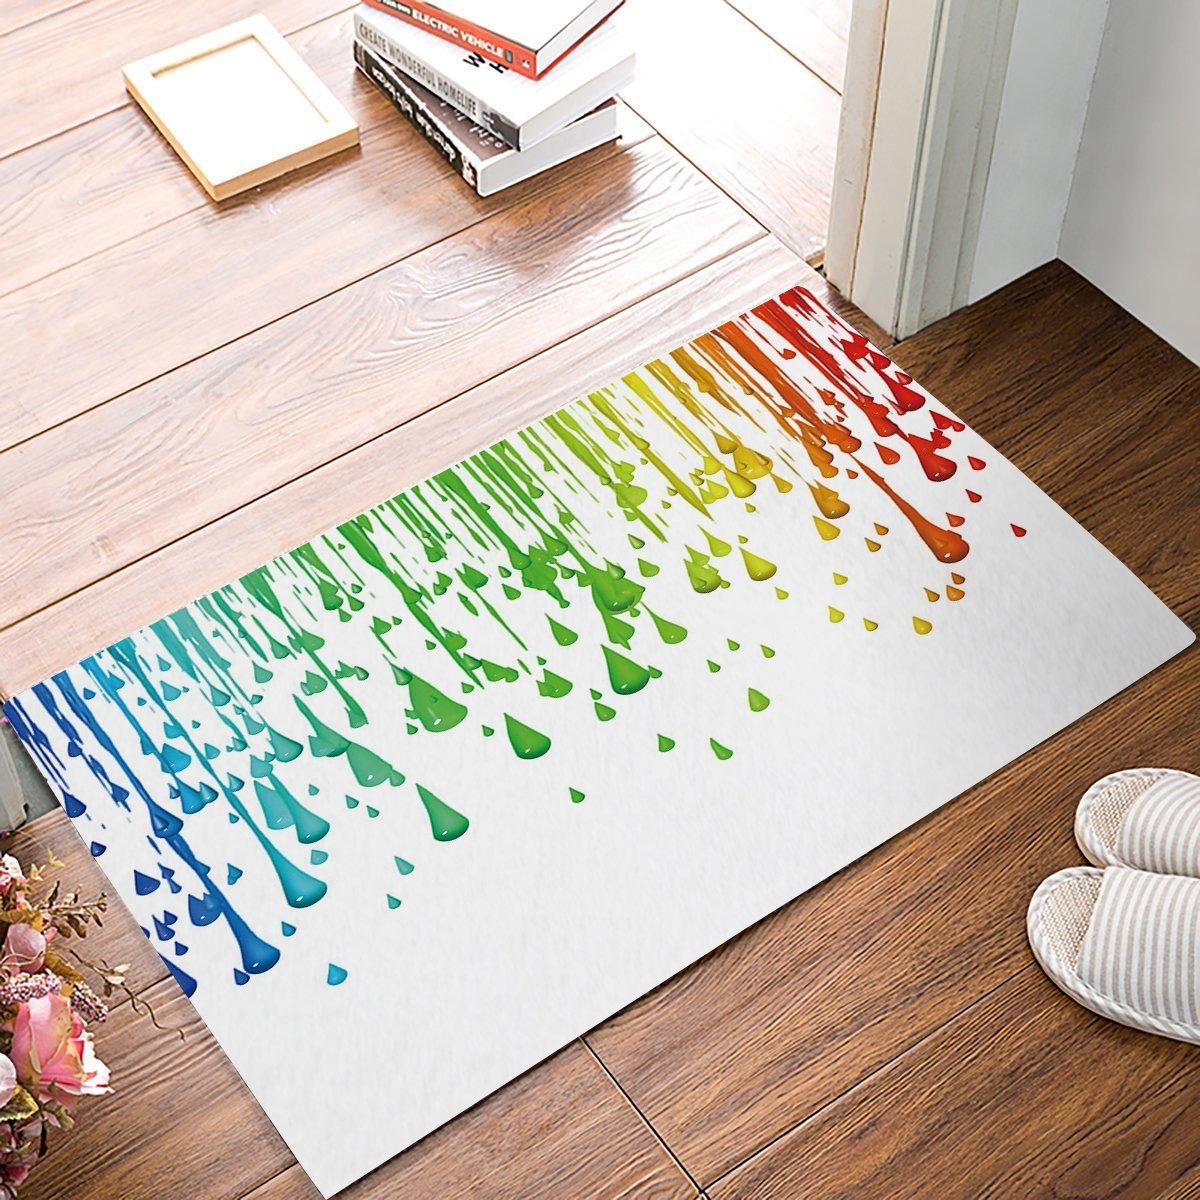 Contemporary Art Modern Colorful Water Drops Door Mats Indoor Kitchen Floor Bathroom Entrance Rug Mat Carpets Home Decor Mat Aliexpress